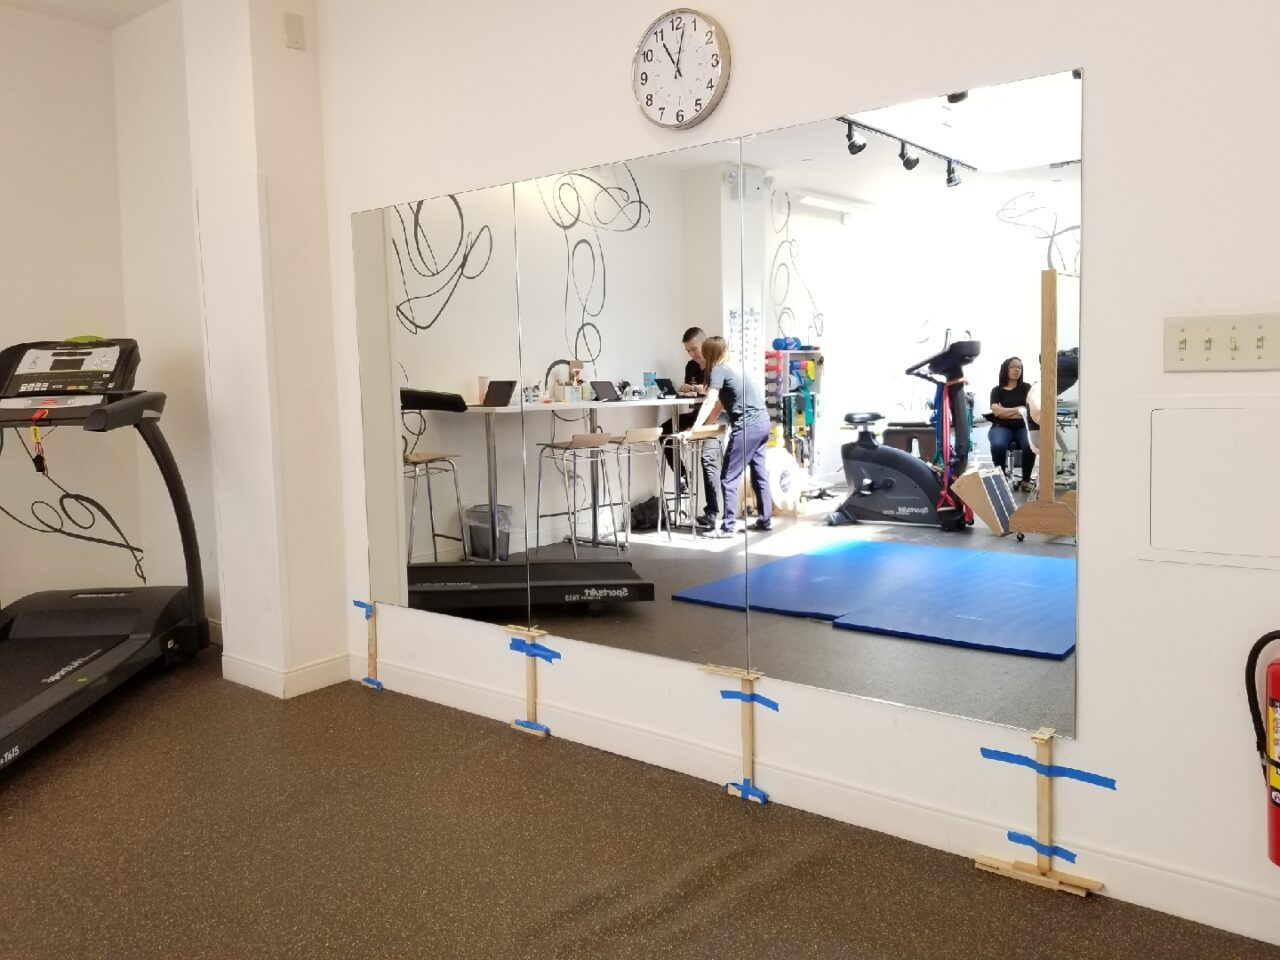 mirror gym nyc